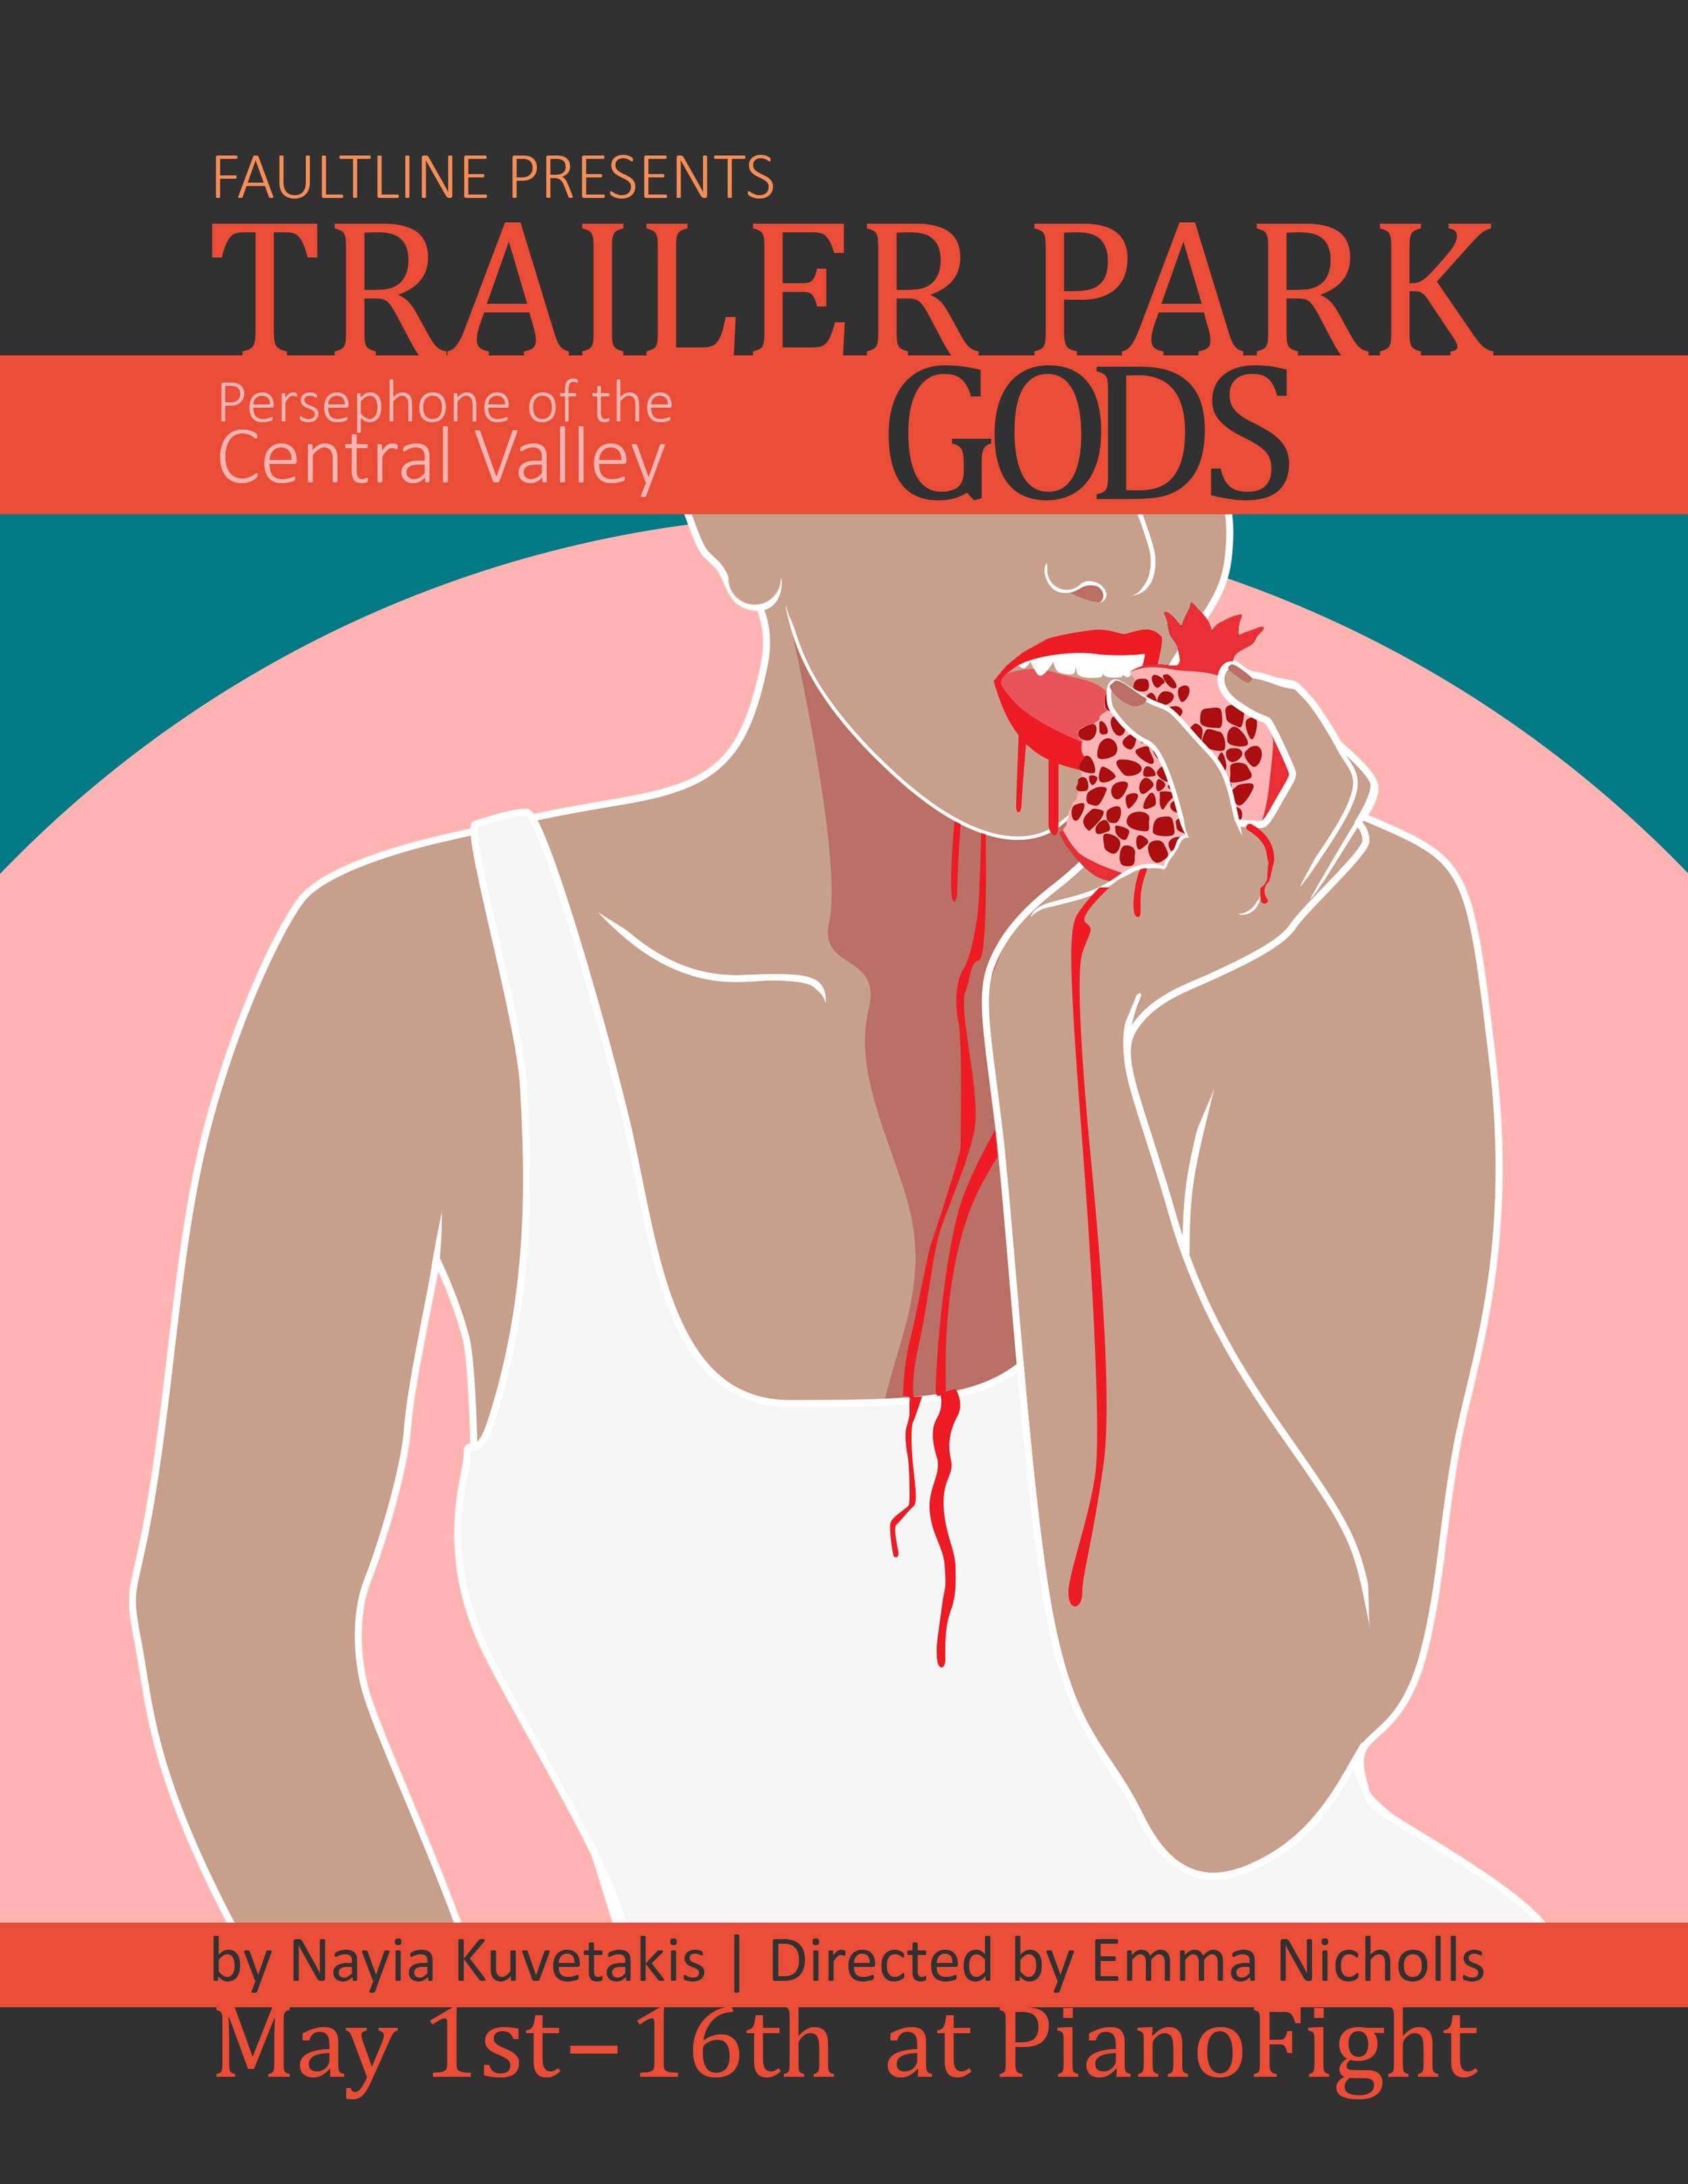 Trailer Park Gods